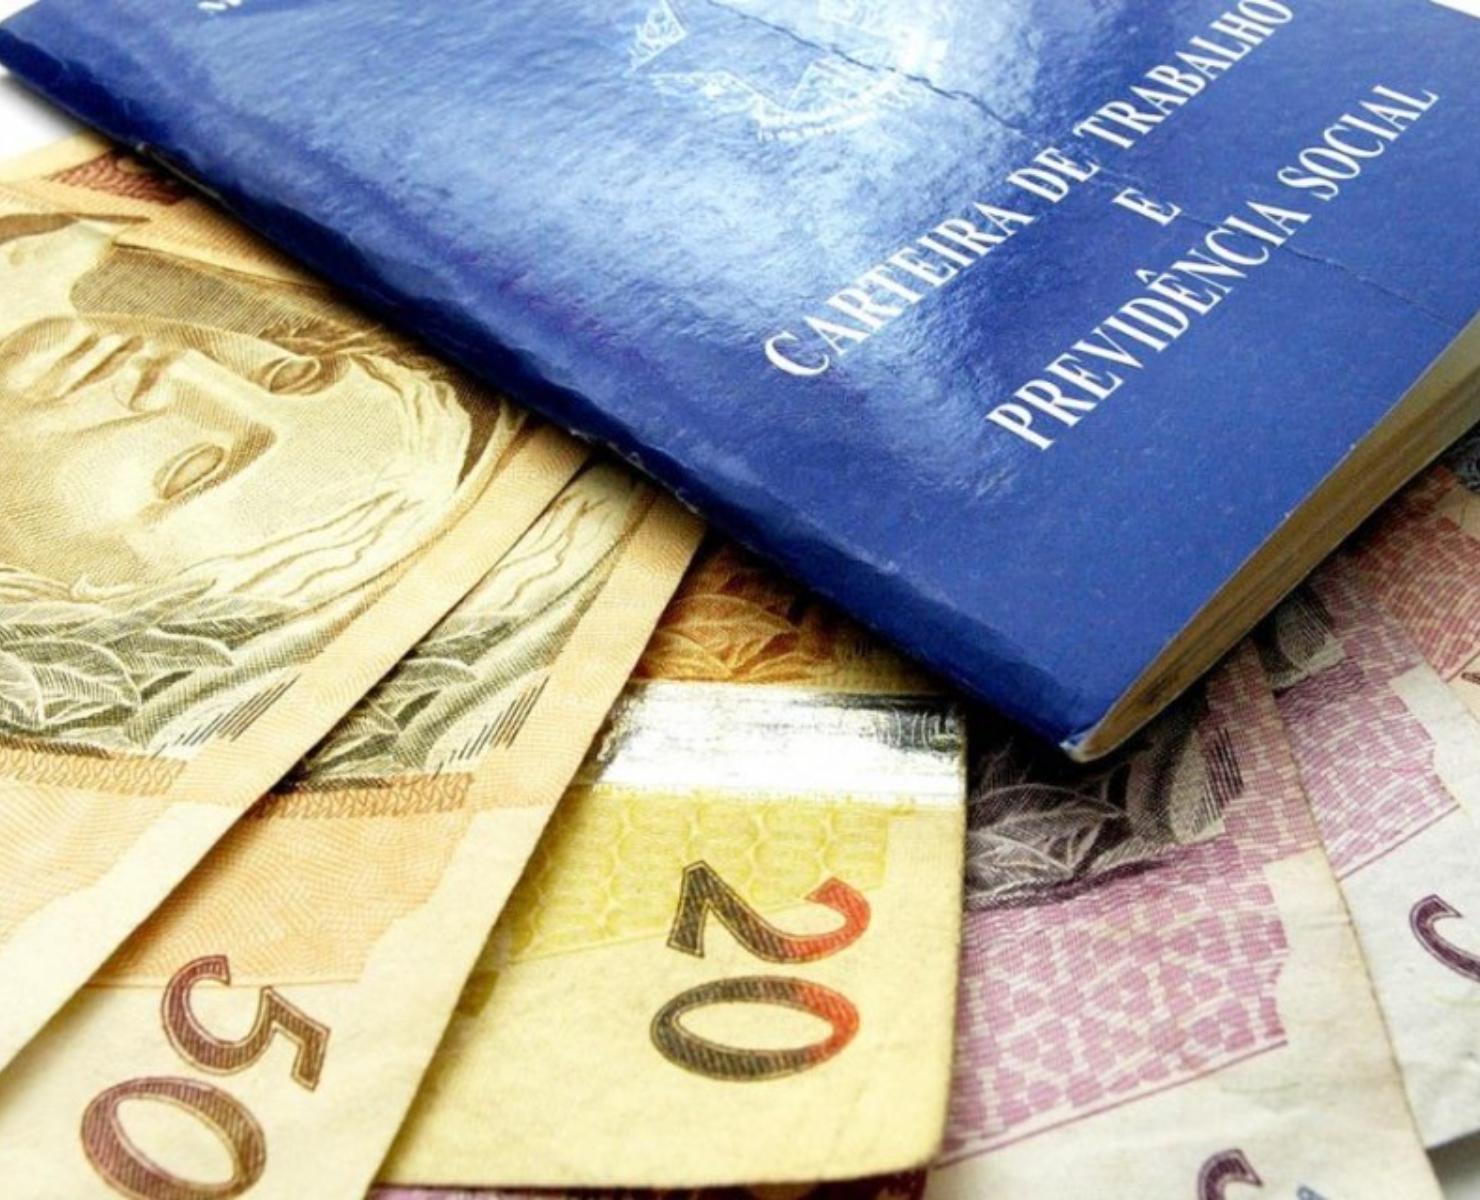 ECONOMIA: GOVERNO FEDERAL ESTUDA LIBERAR FGTS